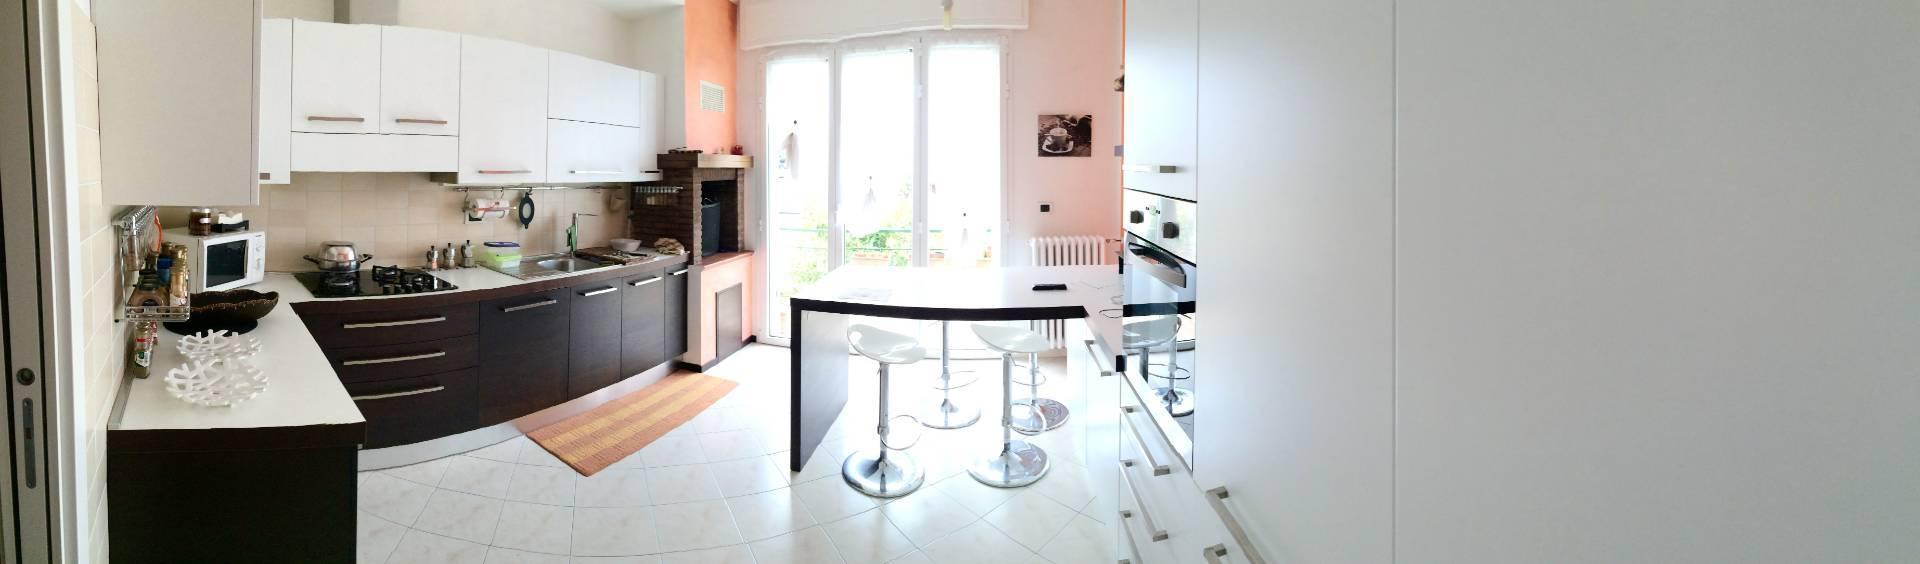 Appartamento, 100 Mq, Affitto - Forlì (Forlì - Cesena)